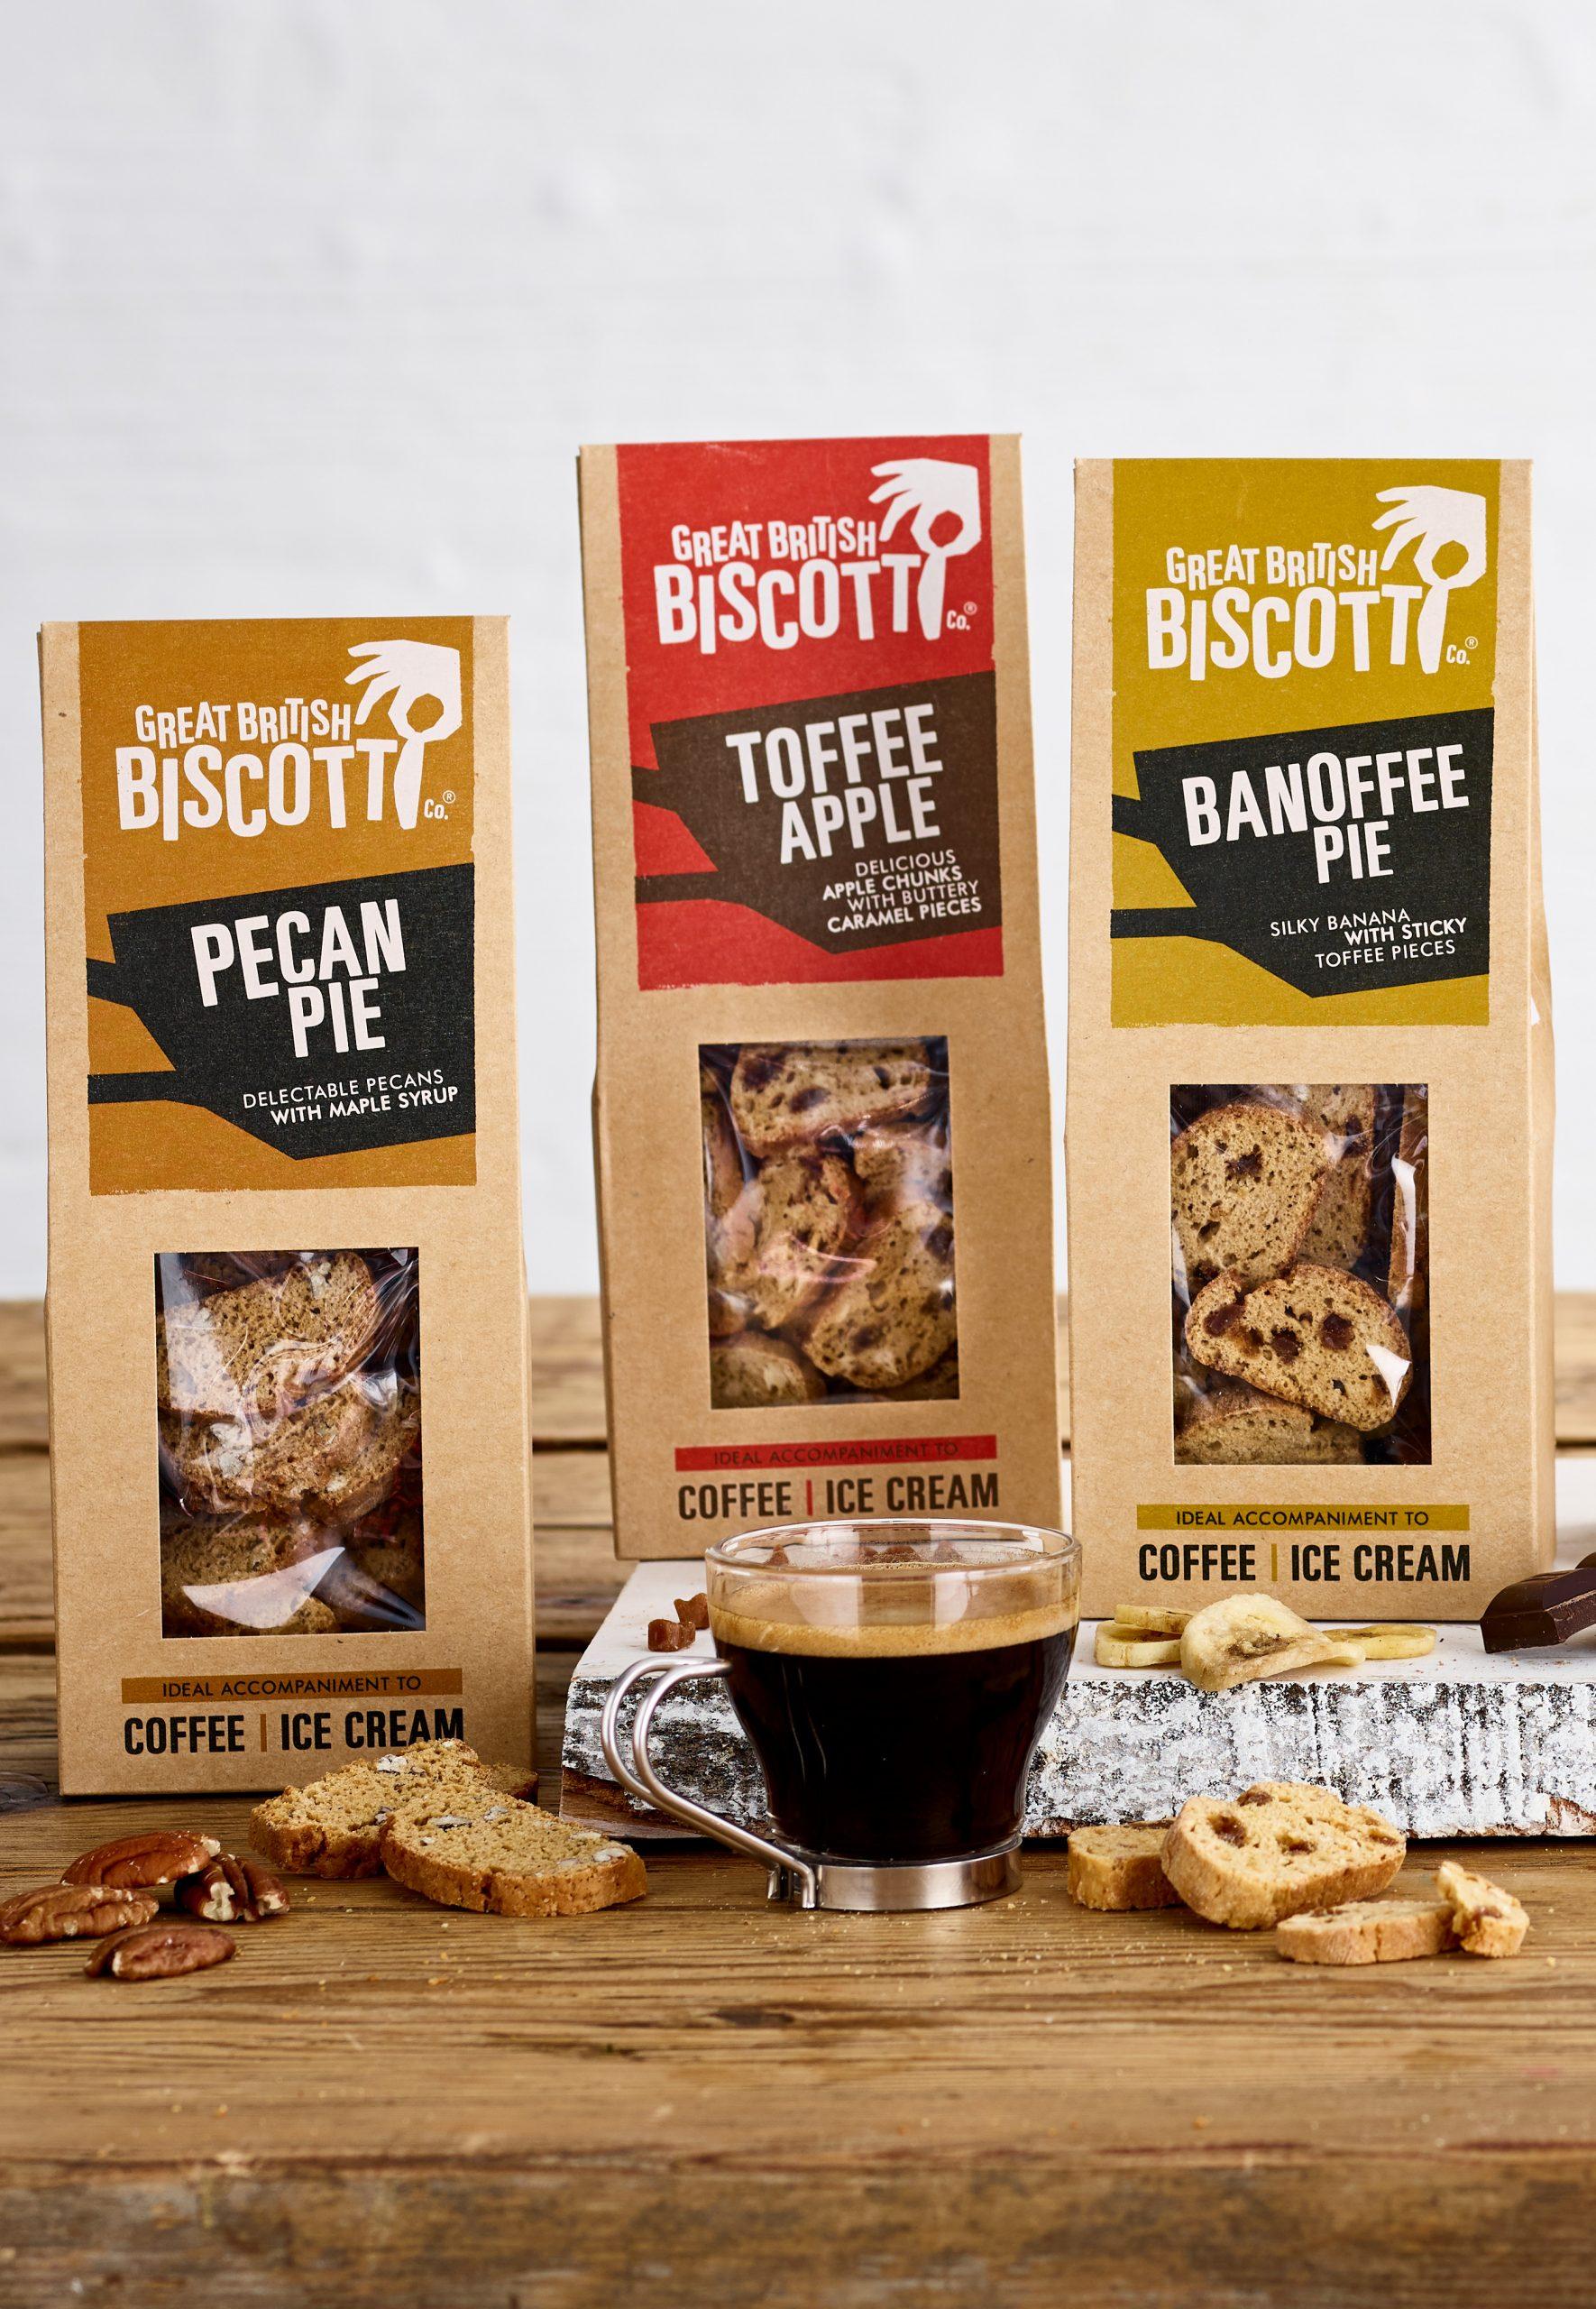 biscotti range 1